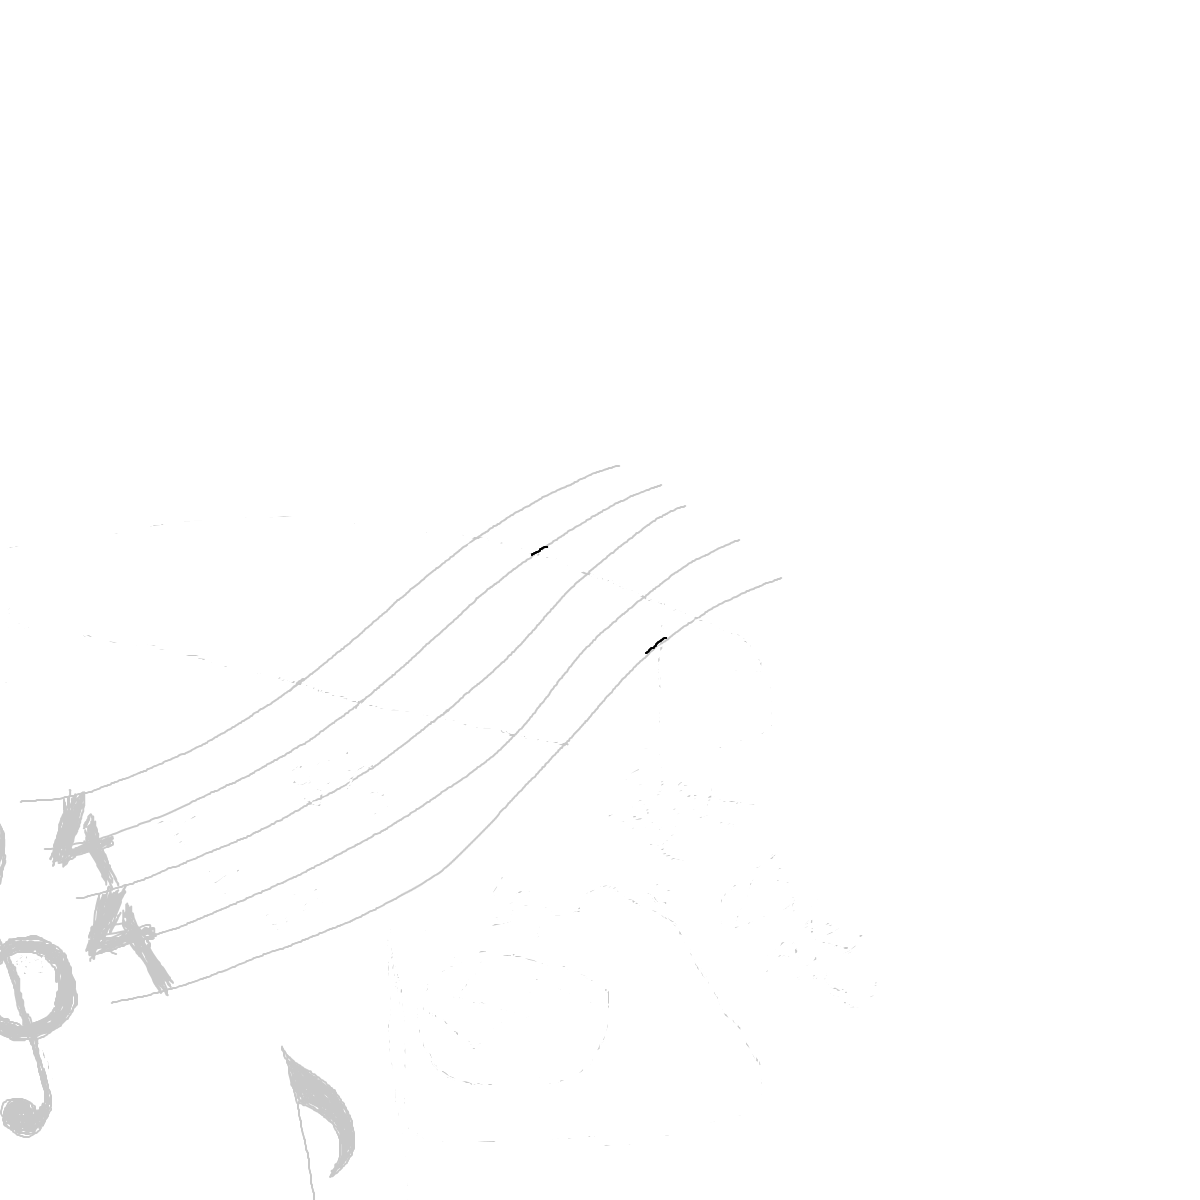 BAAAM drawing#13868 lat:39.7172241210937500lng: -75.6447219848632800